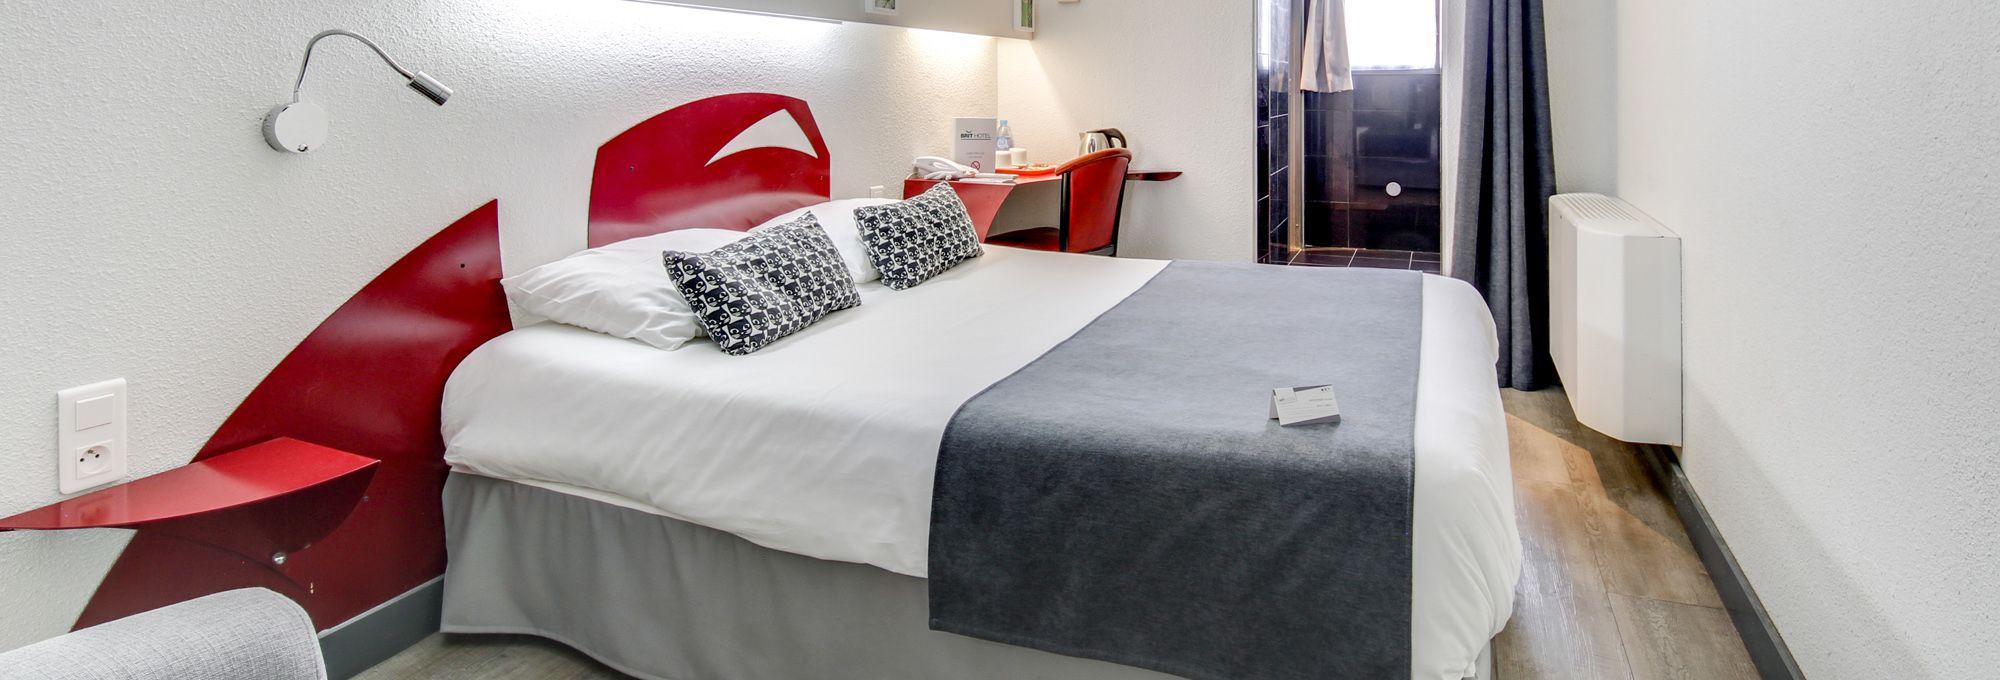 tourisme perpignan visites et d couvertes. Black Bedroom Furniture Sets. Home Design Ideas